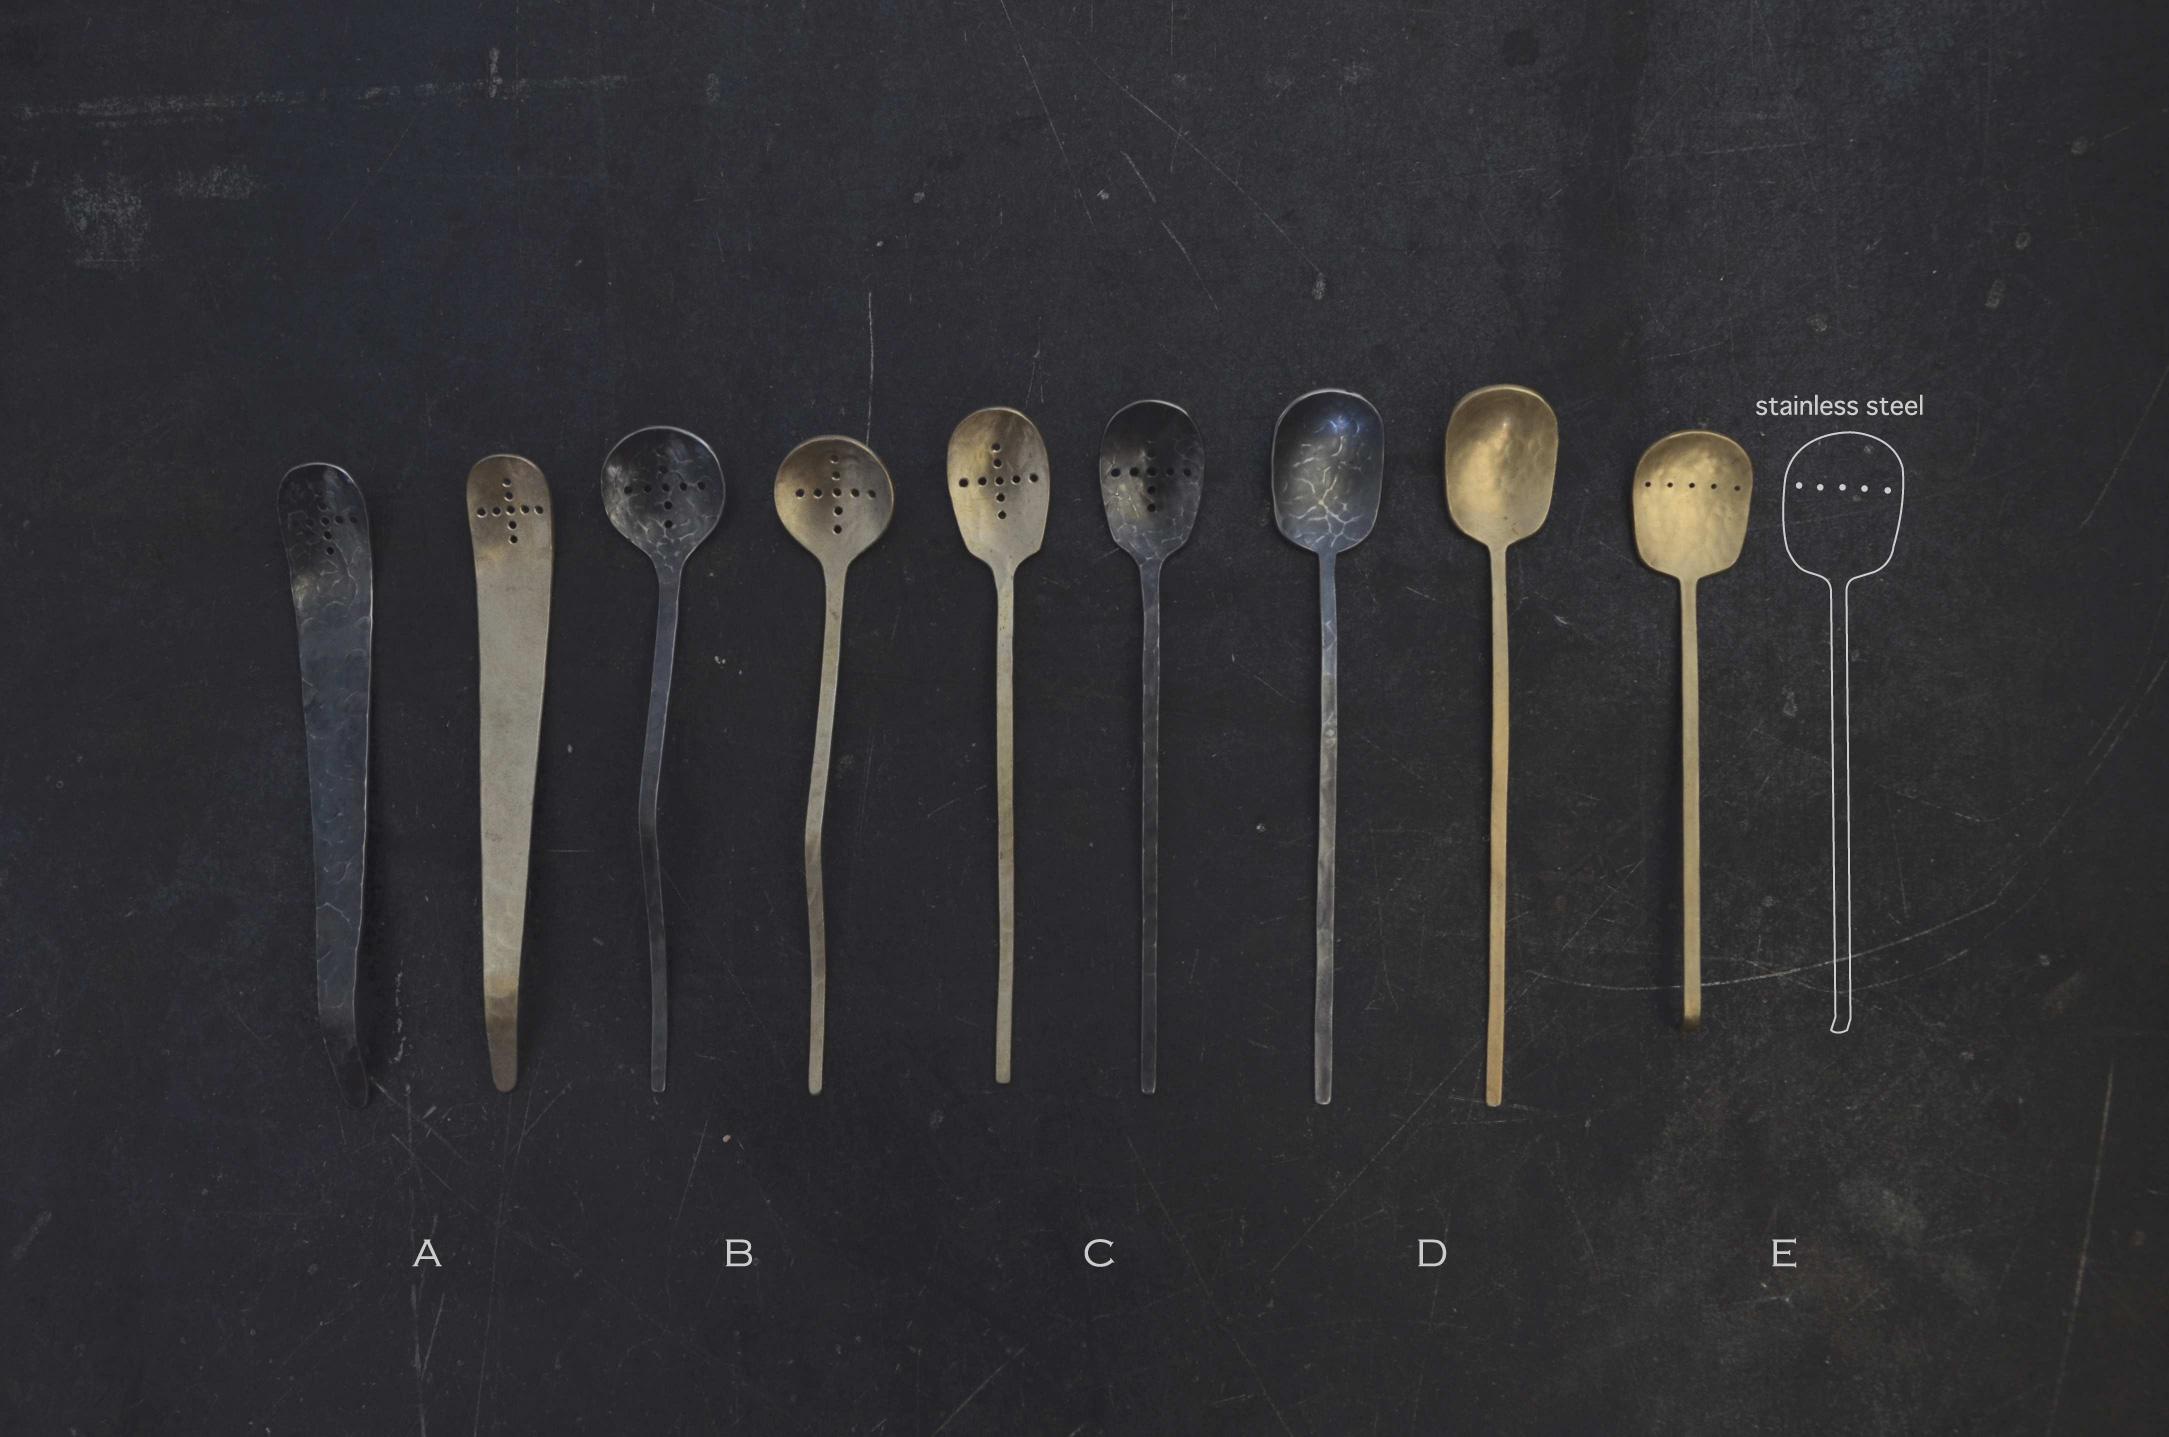 Tea spoon SM(single material)